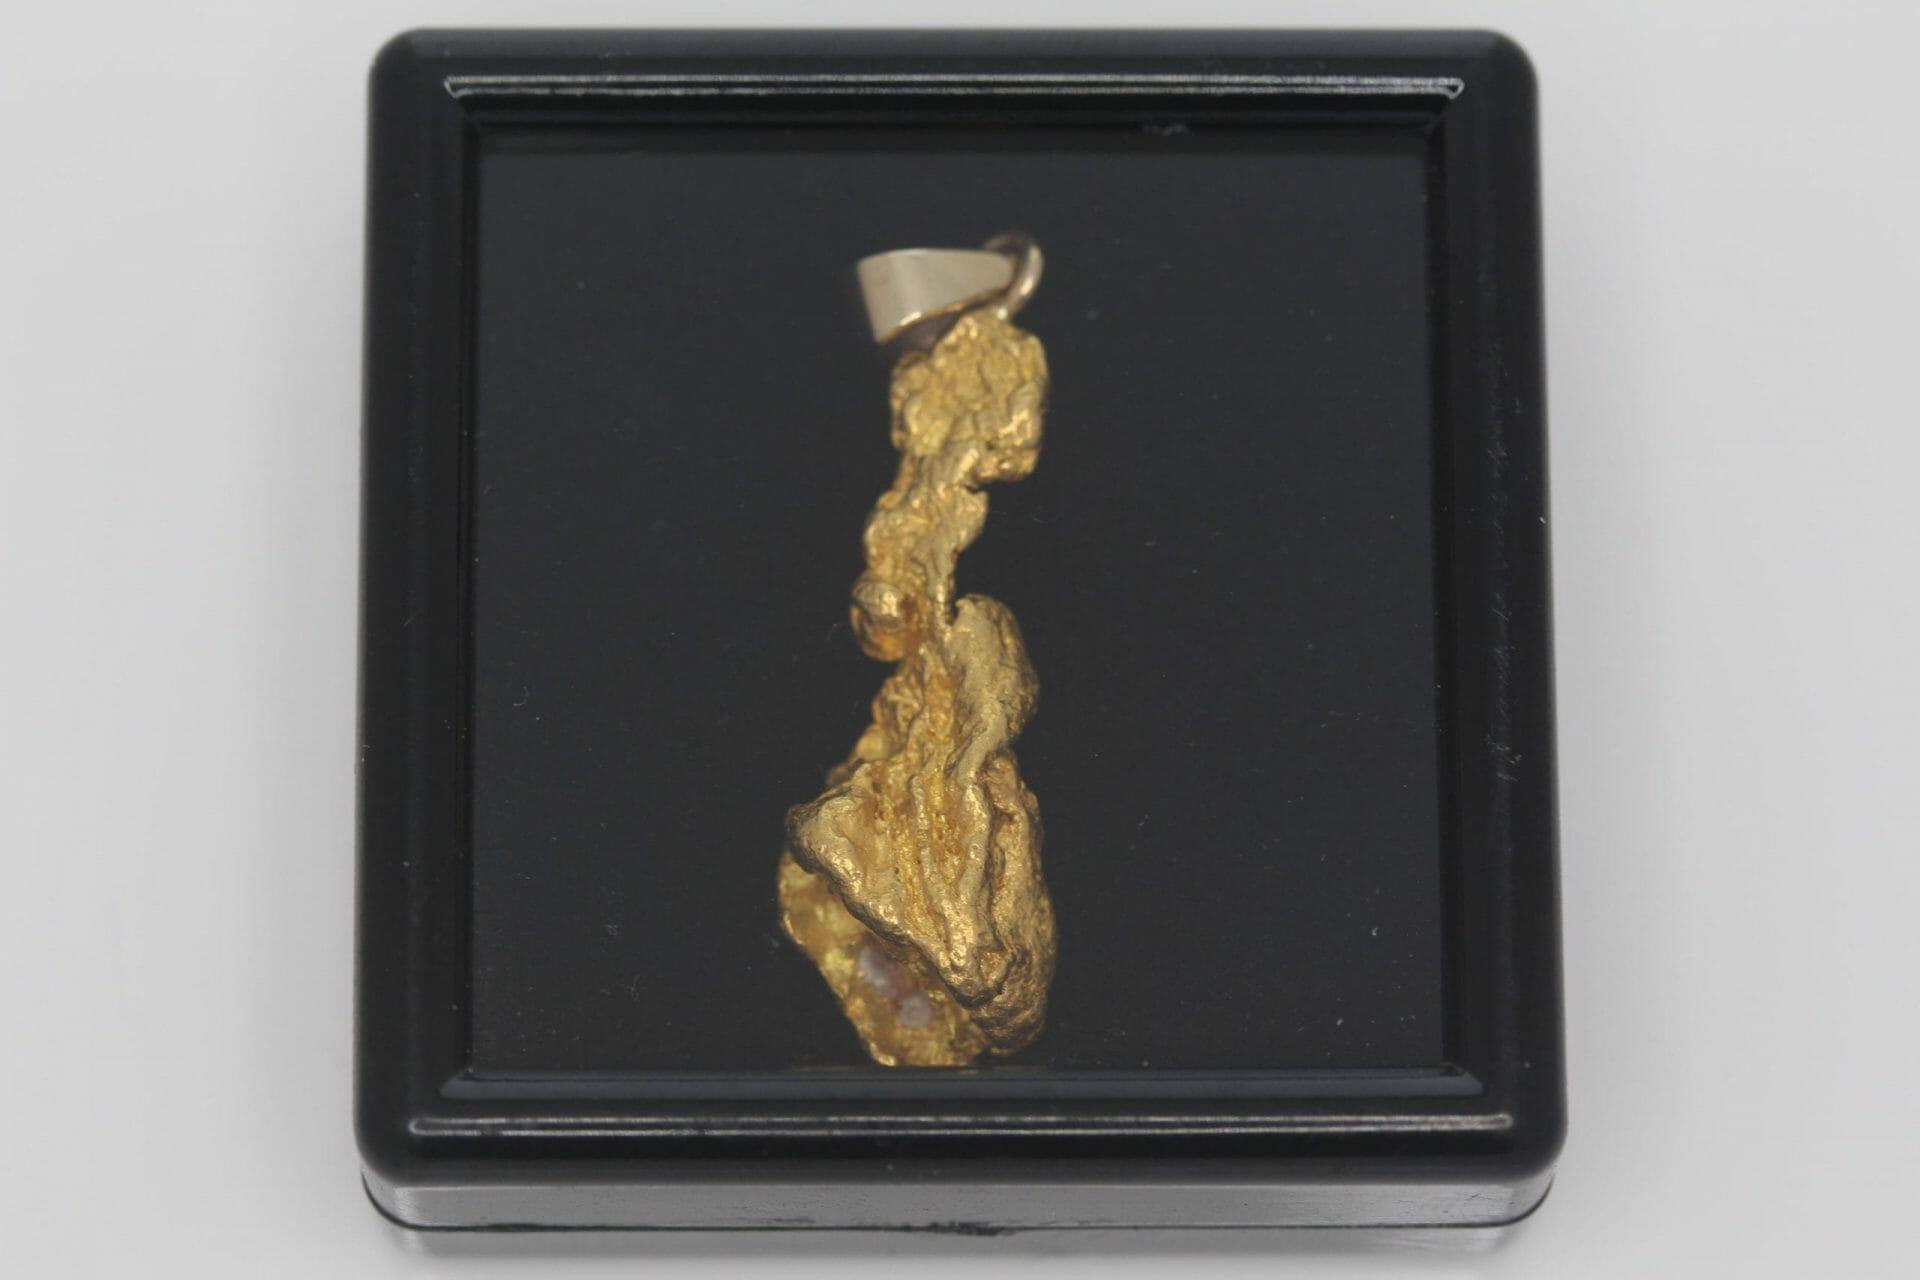 Natural Australian Gold Nugget Pendant - 6.94g 10